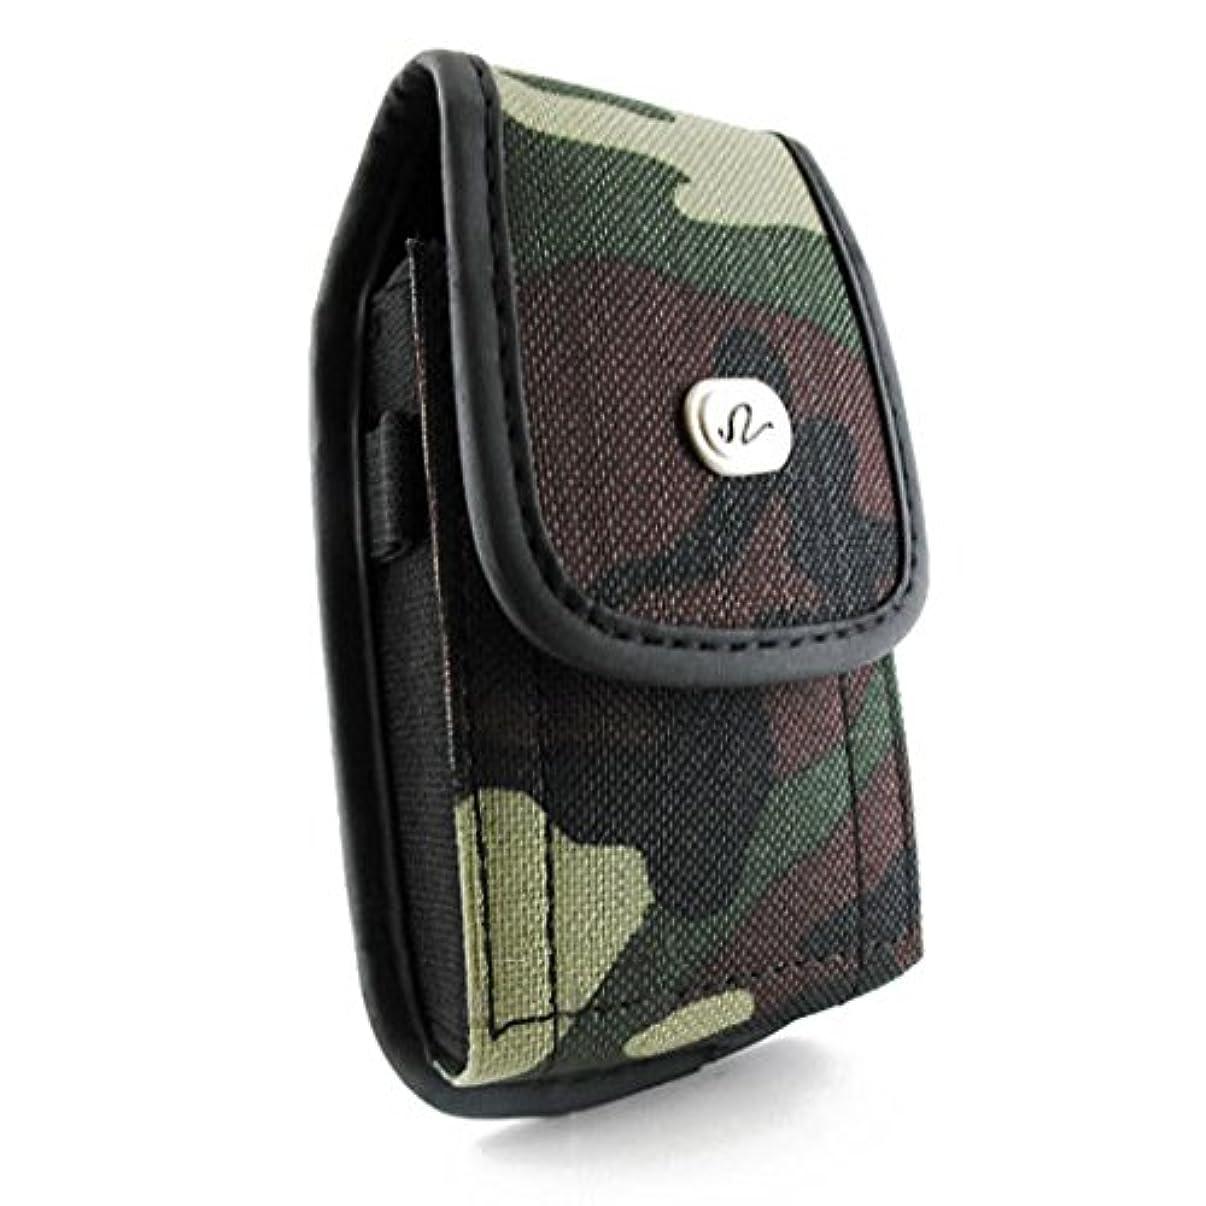 Motorola RAZR V3 Heavy Duty Rugged Vertical Nylon Canvas Protective Carrying Cell Phone Case Pouch (with Metal belt Clip) for Motorola RAZR V3 V3S V3A V3XX V3M V3C V3I V3T V3R, Camouflage